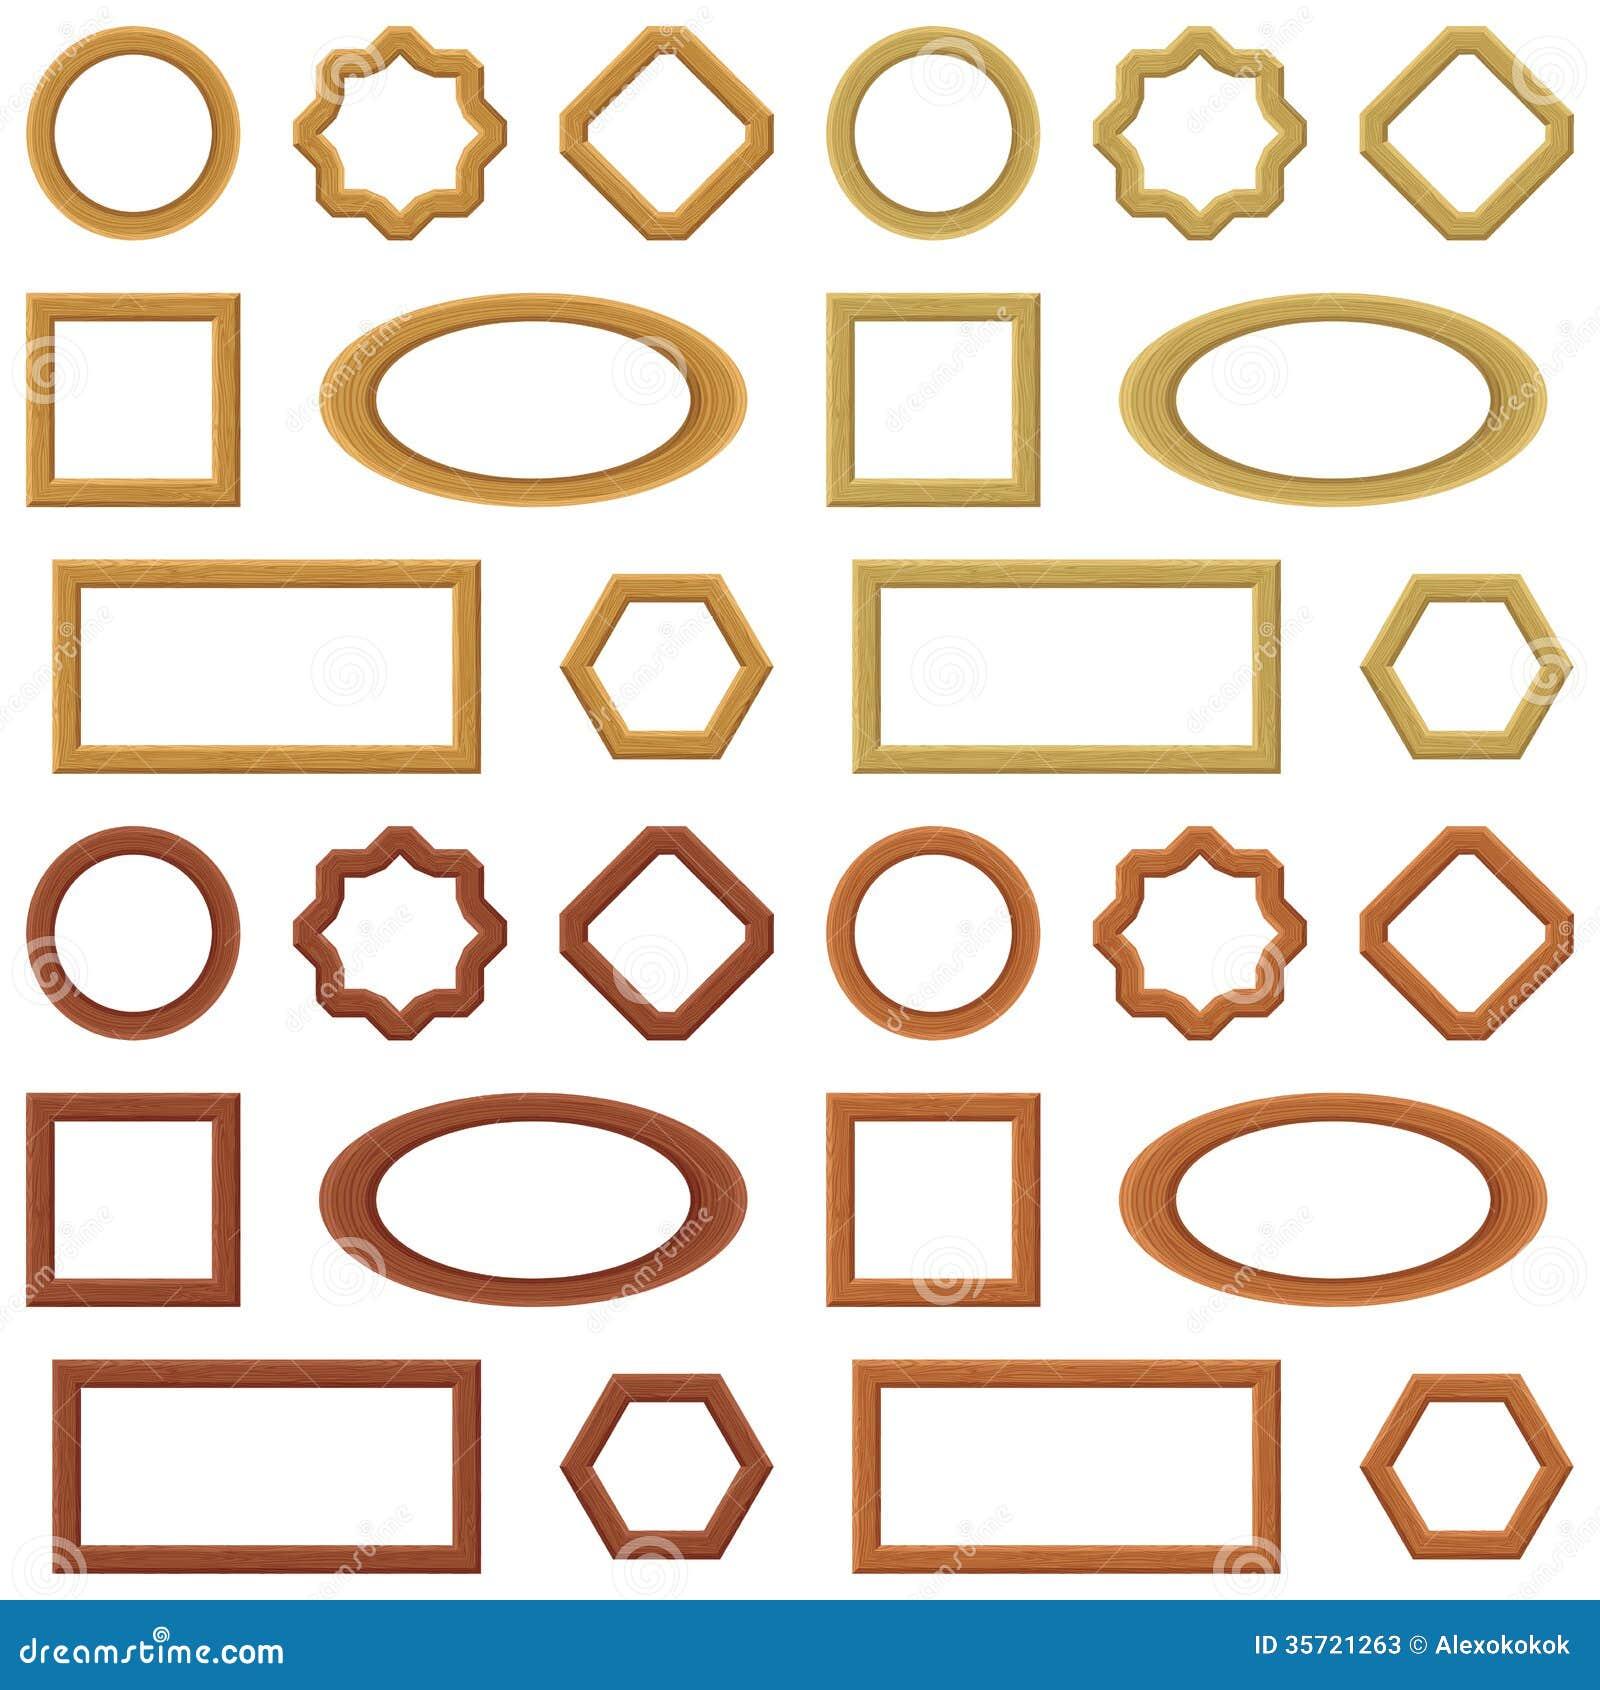 Different Glasses Frame Shapes : Wooden Frames, Set Stock Photos - Image: 35721263